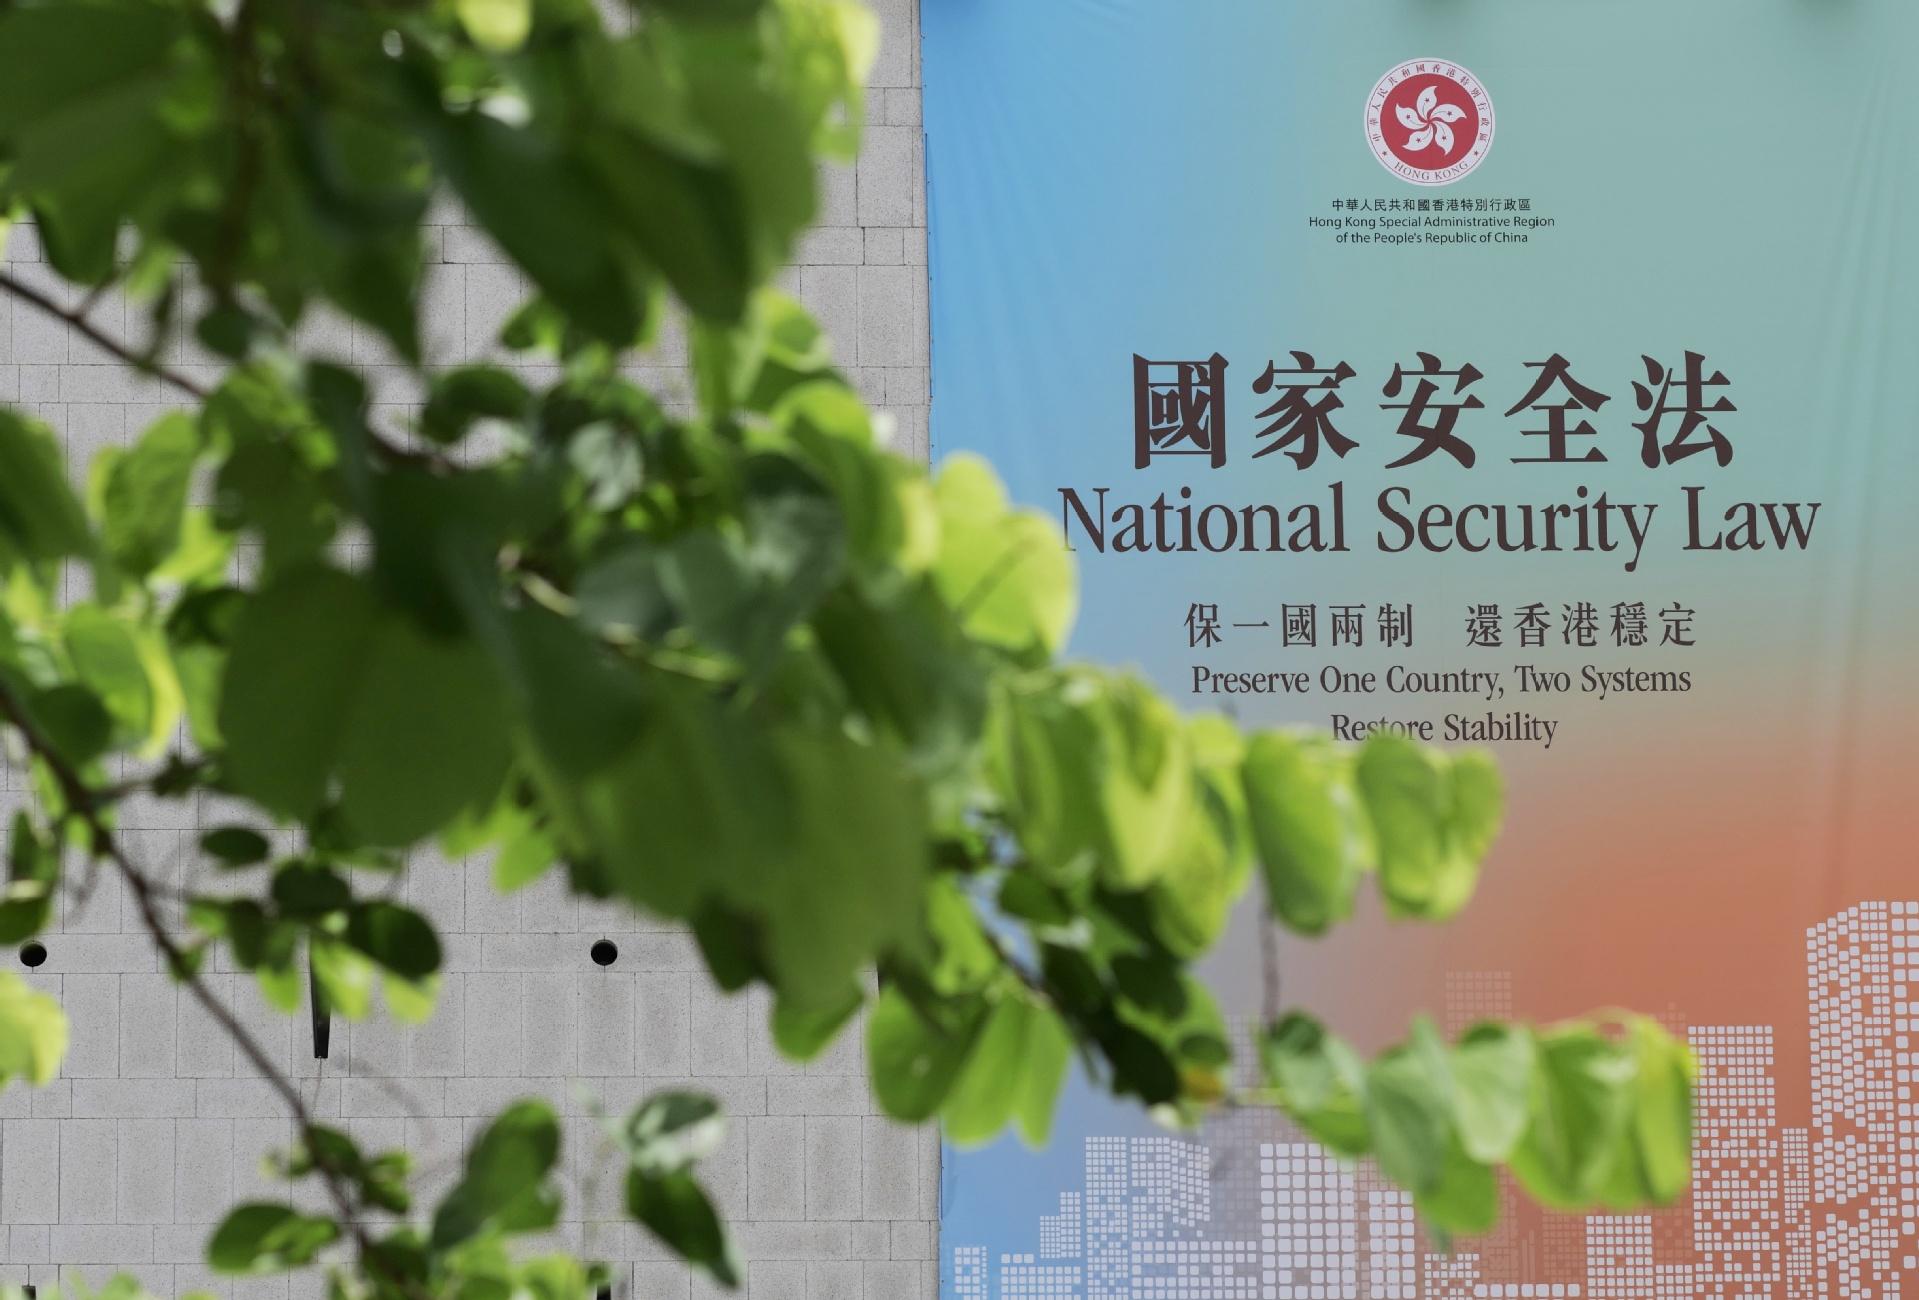 每日一词∣总体国家安全观 a holistic approach to national security